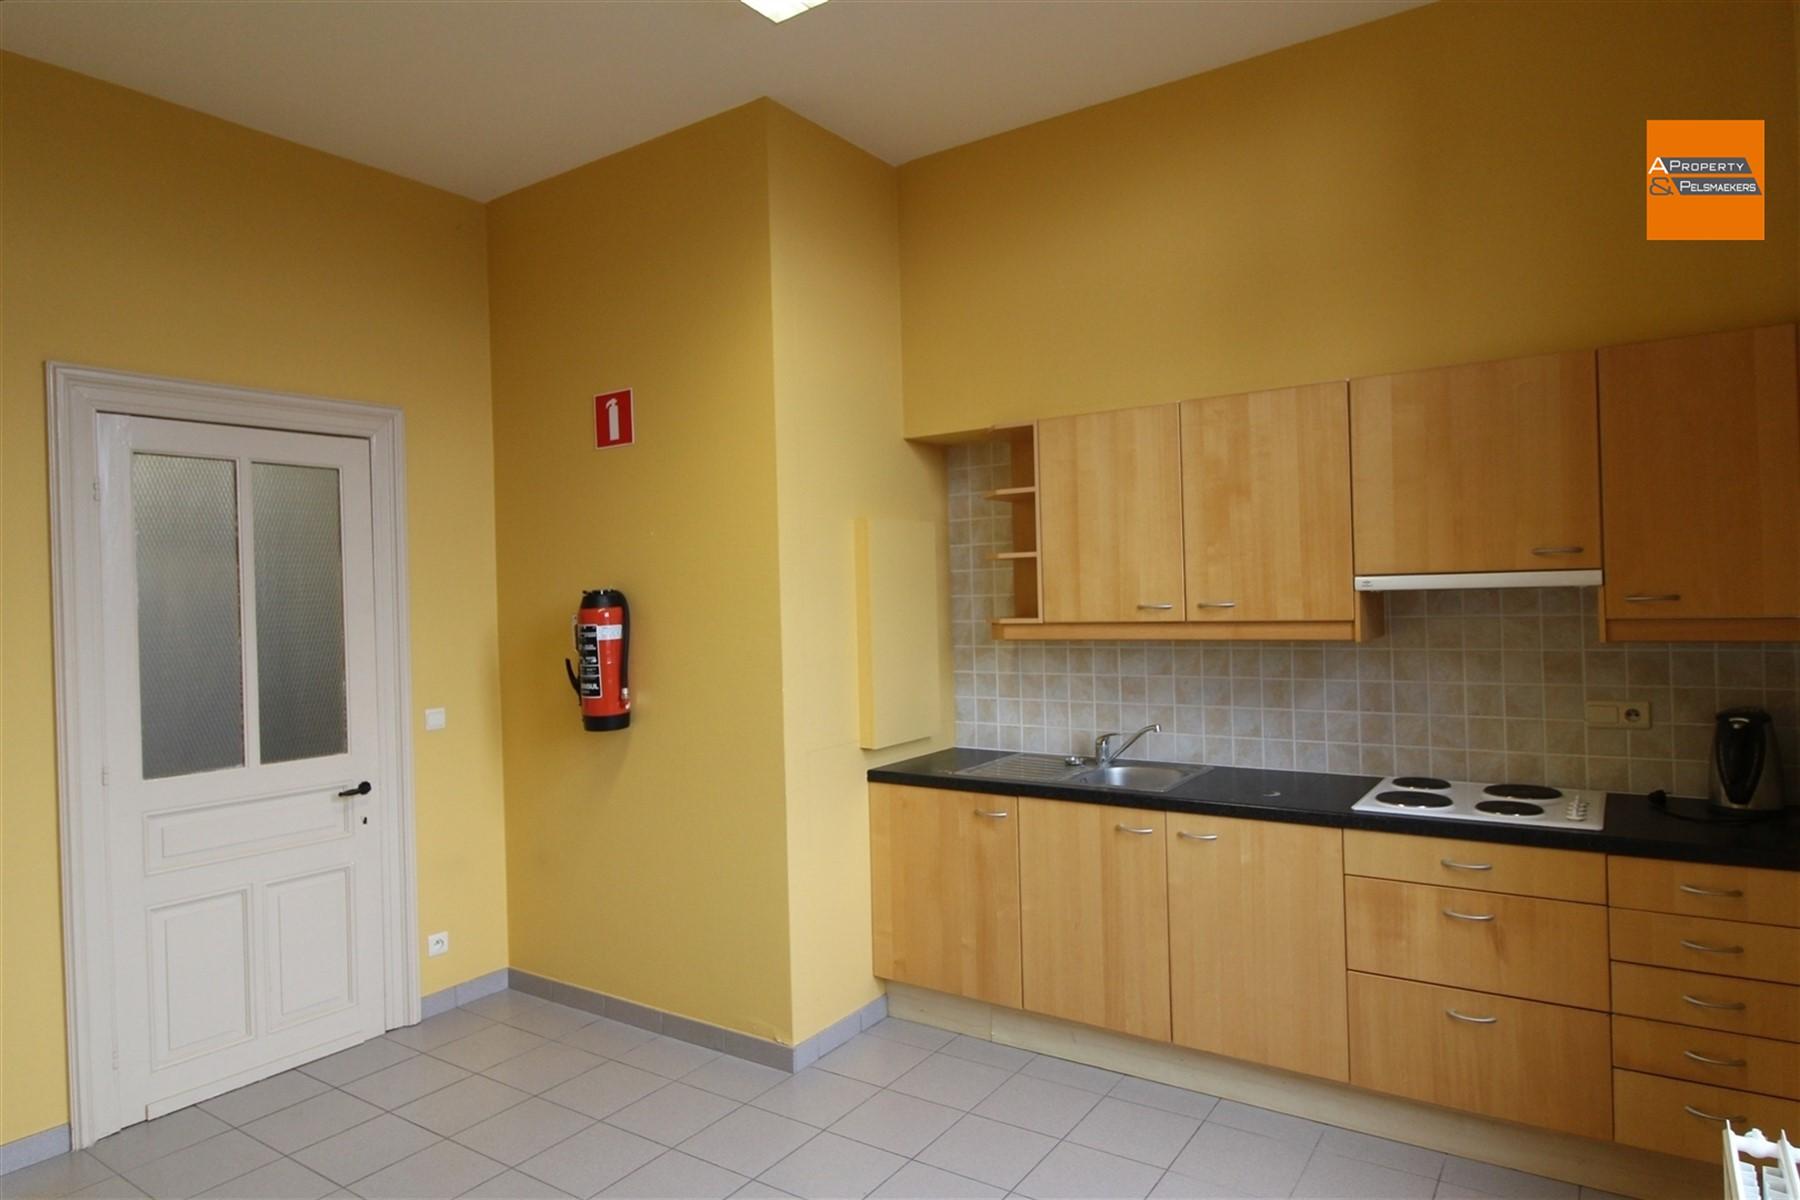 Foto 7 : Huis in  KAMPENHOUT (België) - Prijs € 950